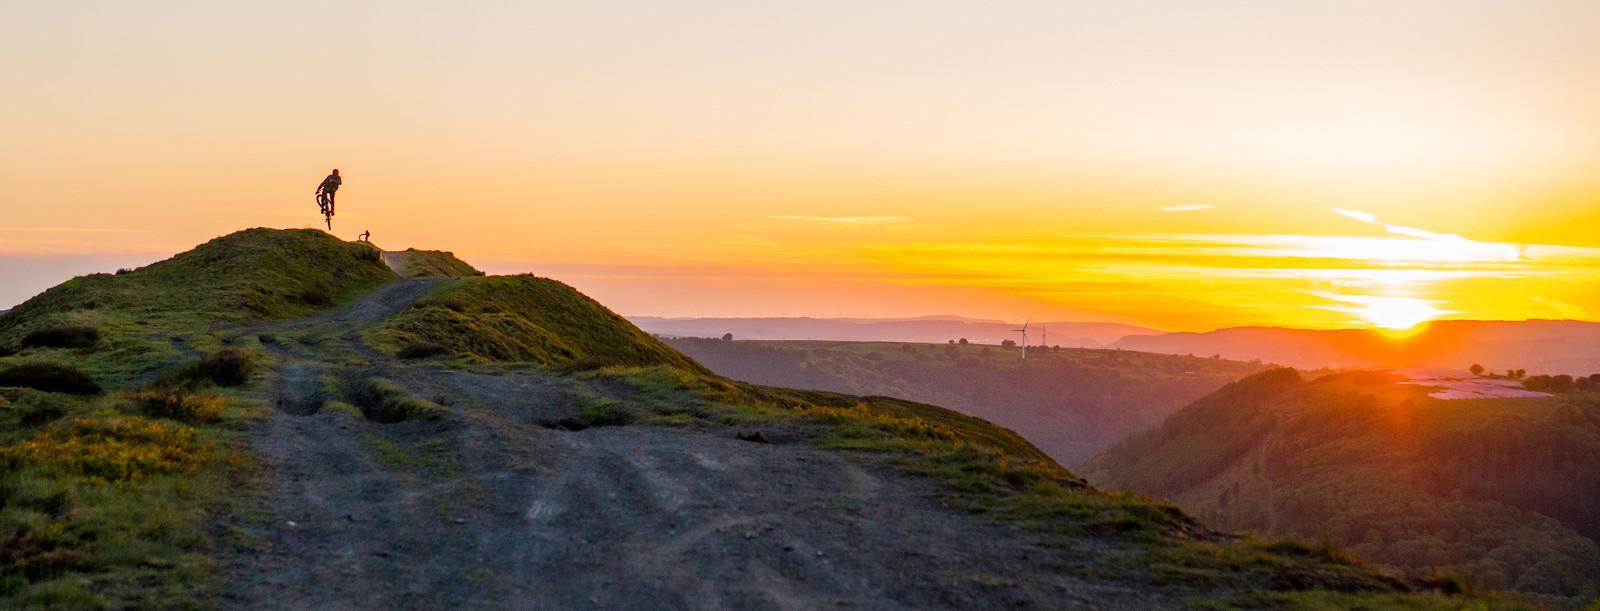 Sunset With Underdogs Cult - Matthew Davies - Mountain Biking Pictures - Vital MTB